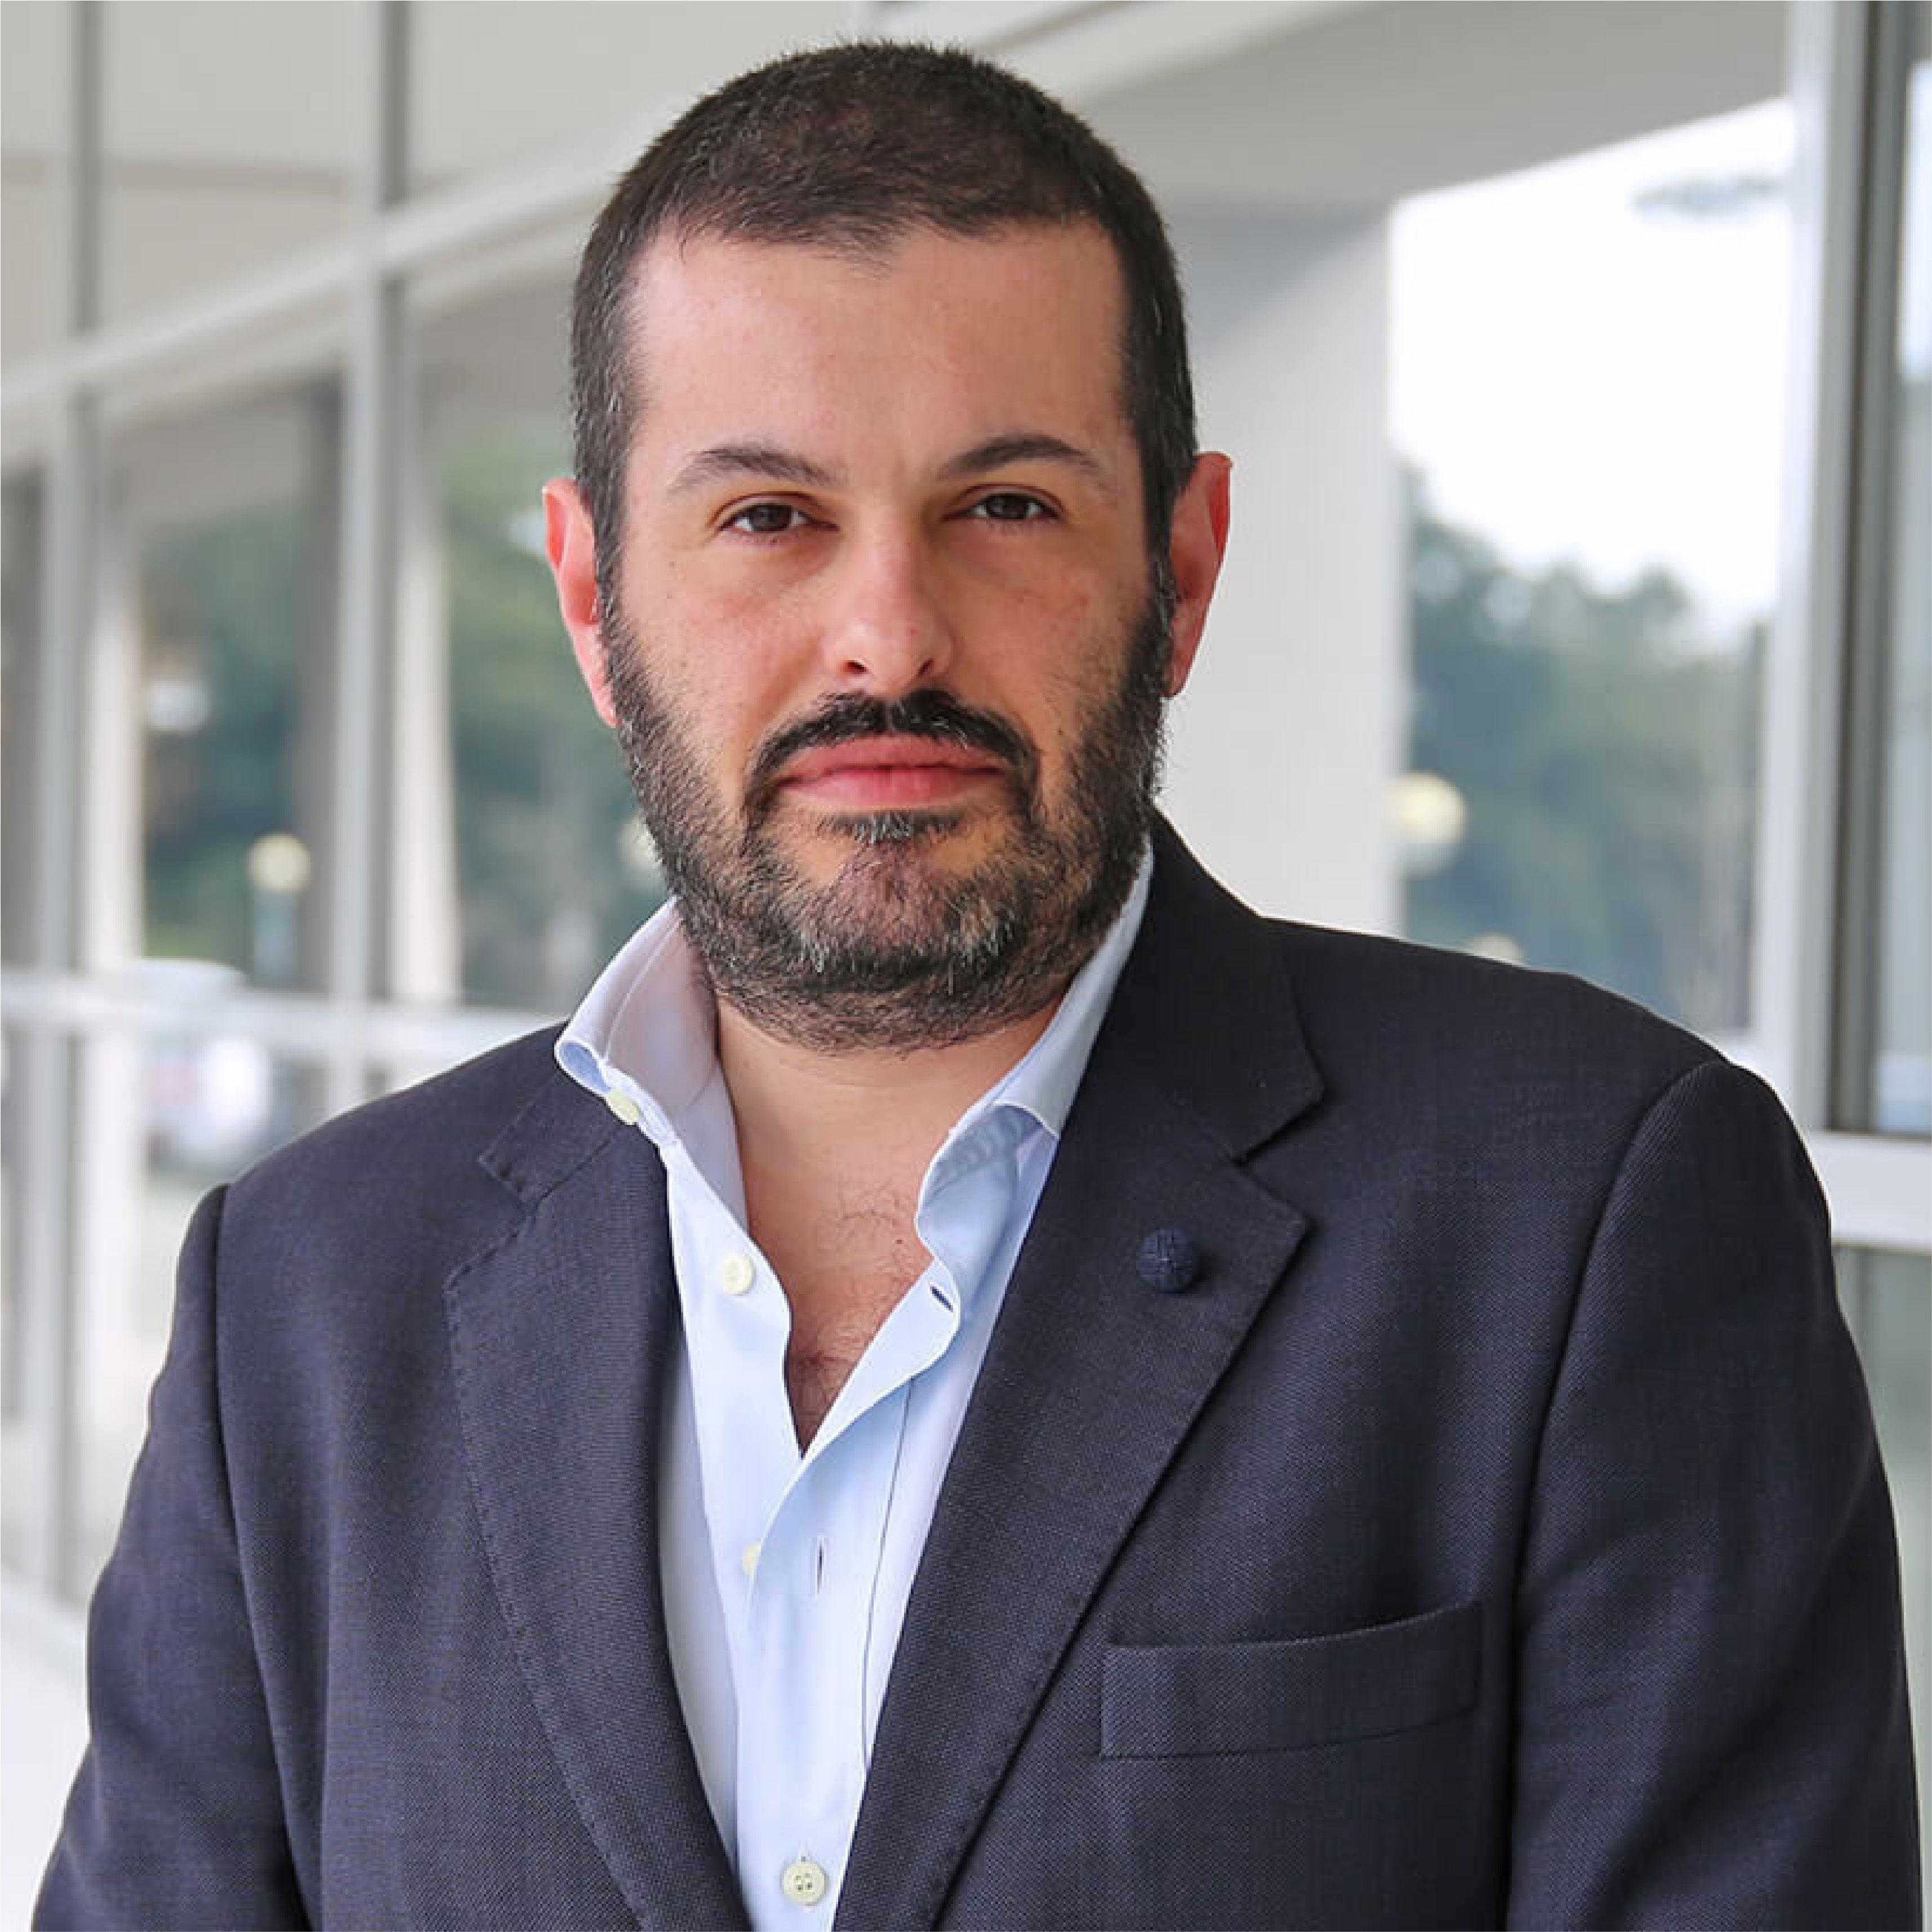 Luís Seca